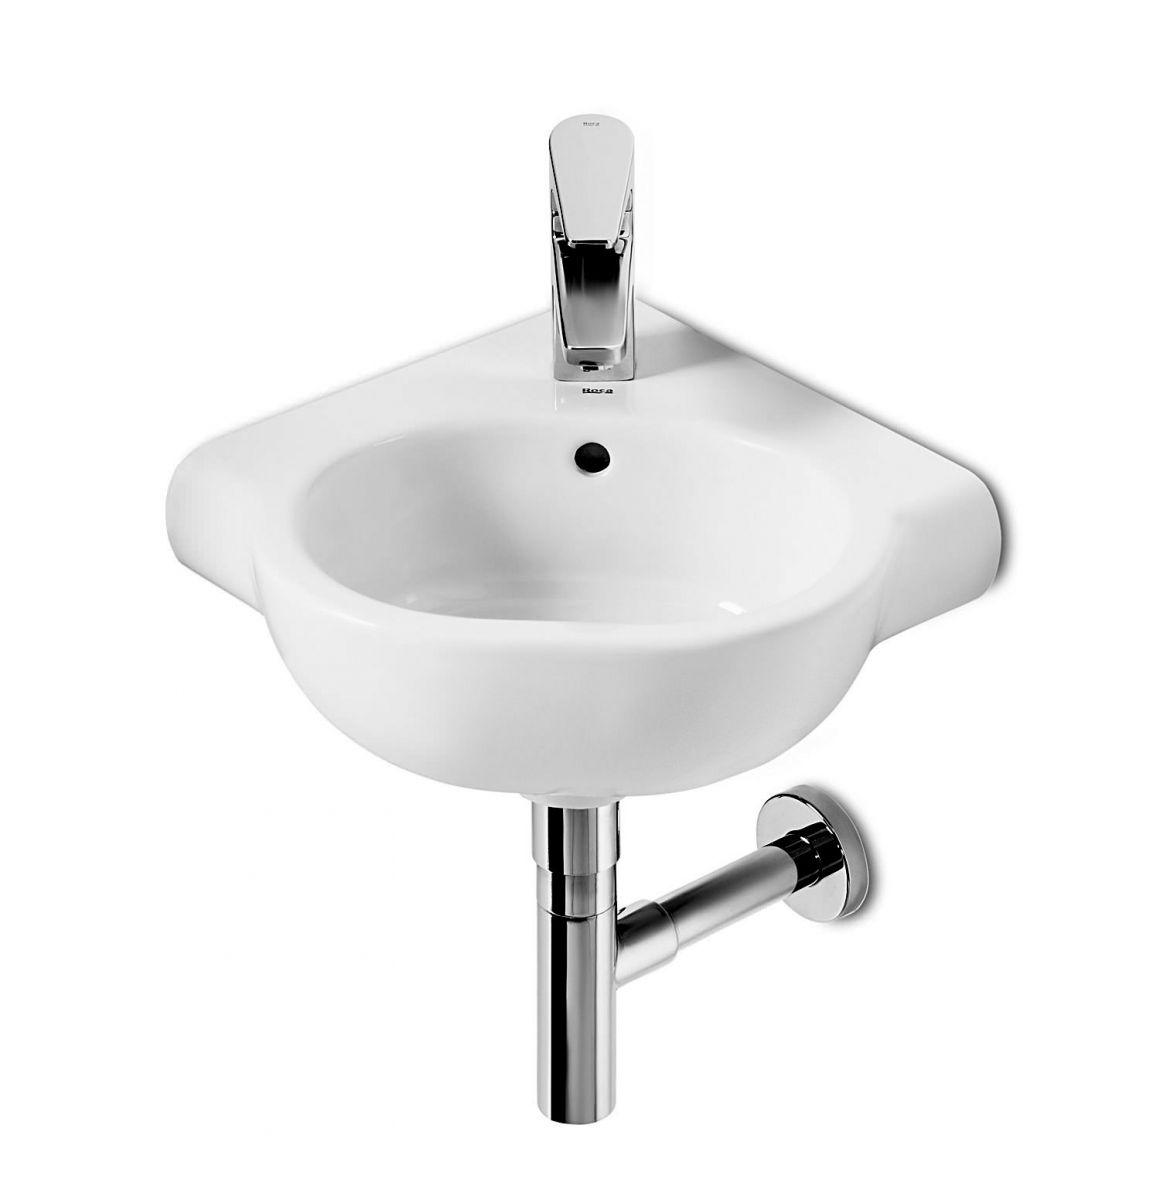 roca meridian n compact corner washbasin - Roca Wash Basin